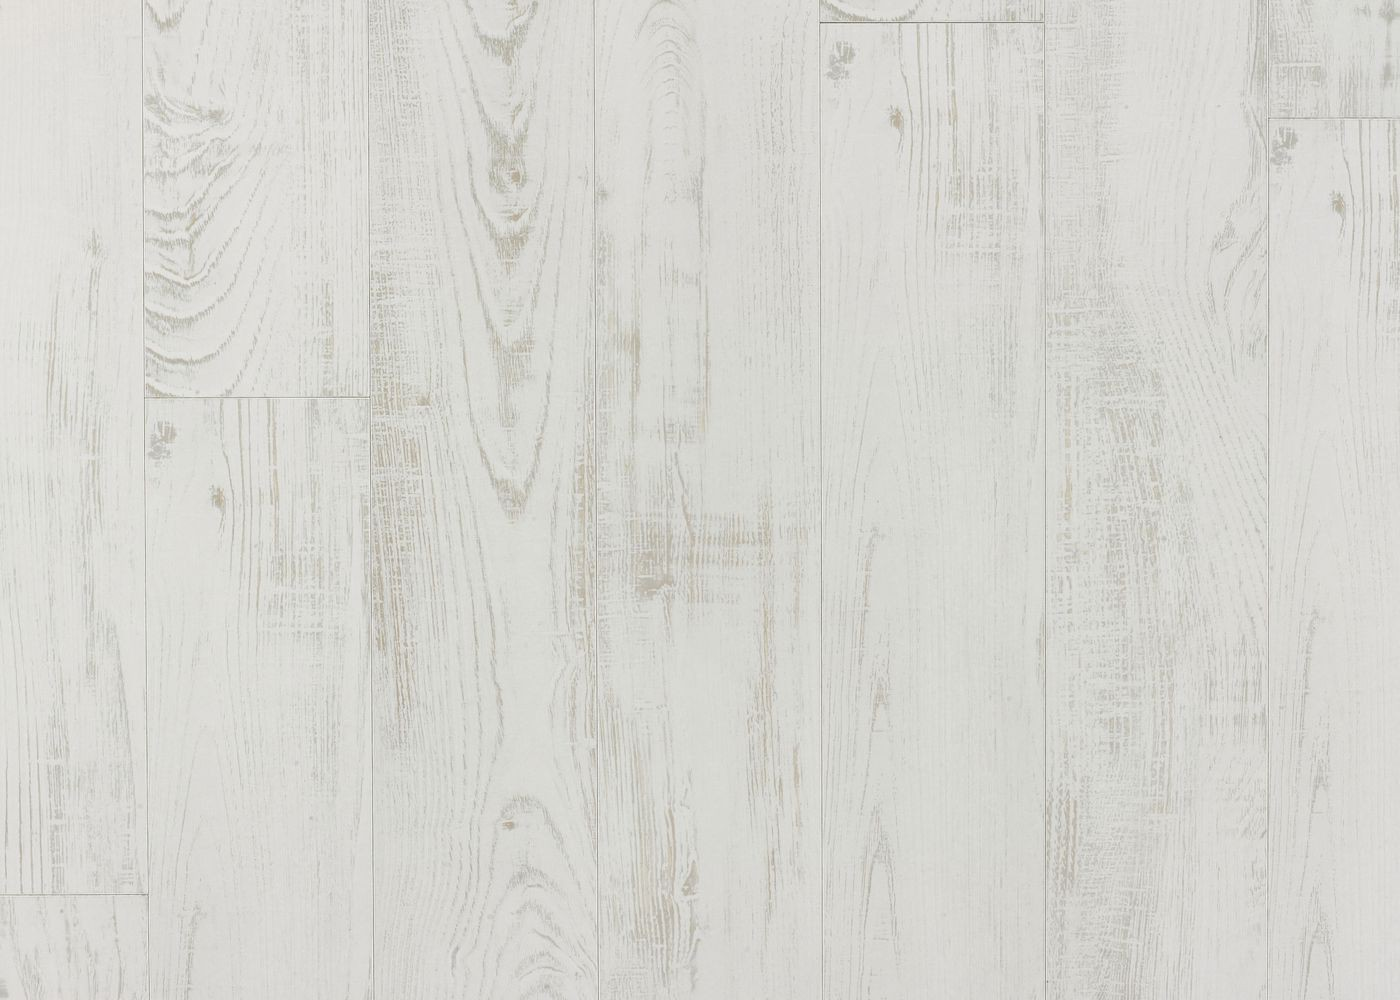 parquet chataignier prix parquet chne massif vauluisant with parquet chataignier prix. Black Bedroom Furniture Sets. Home Design Ideas